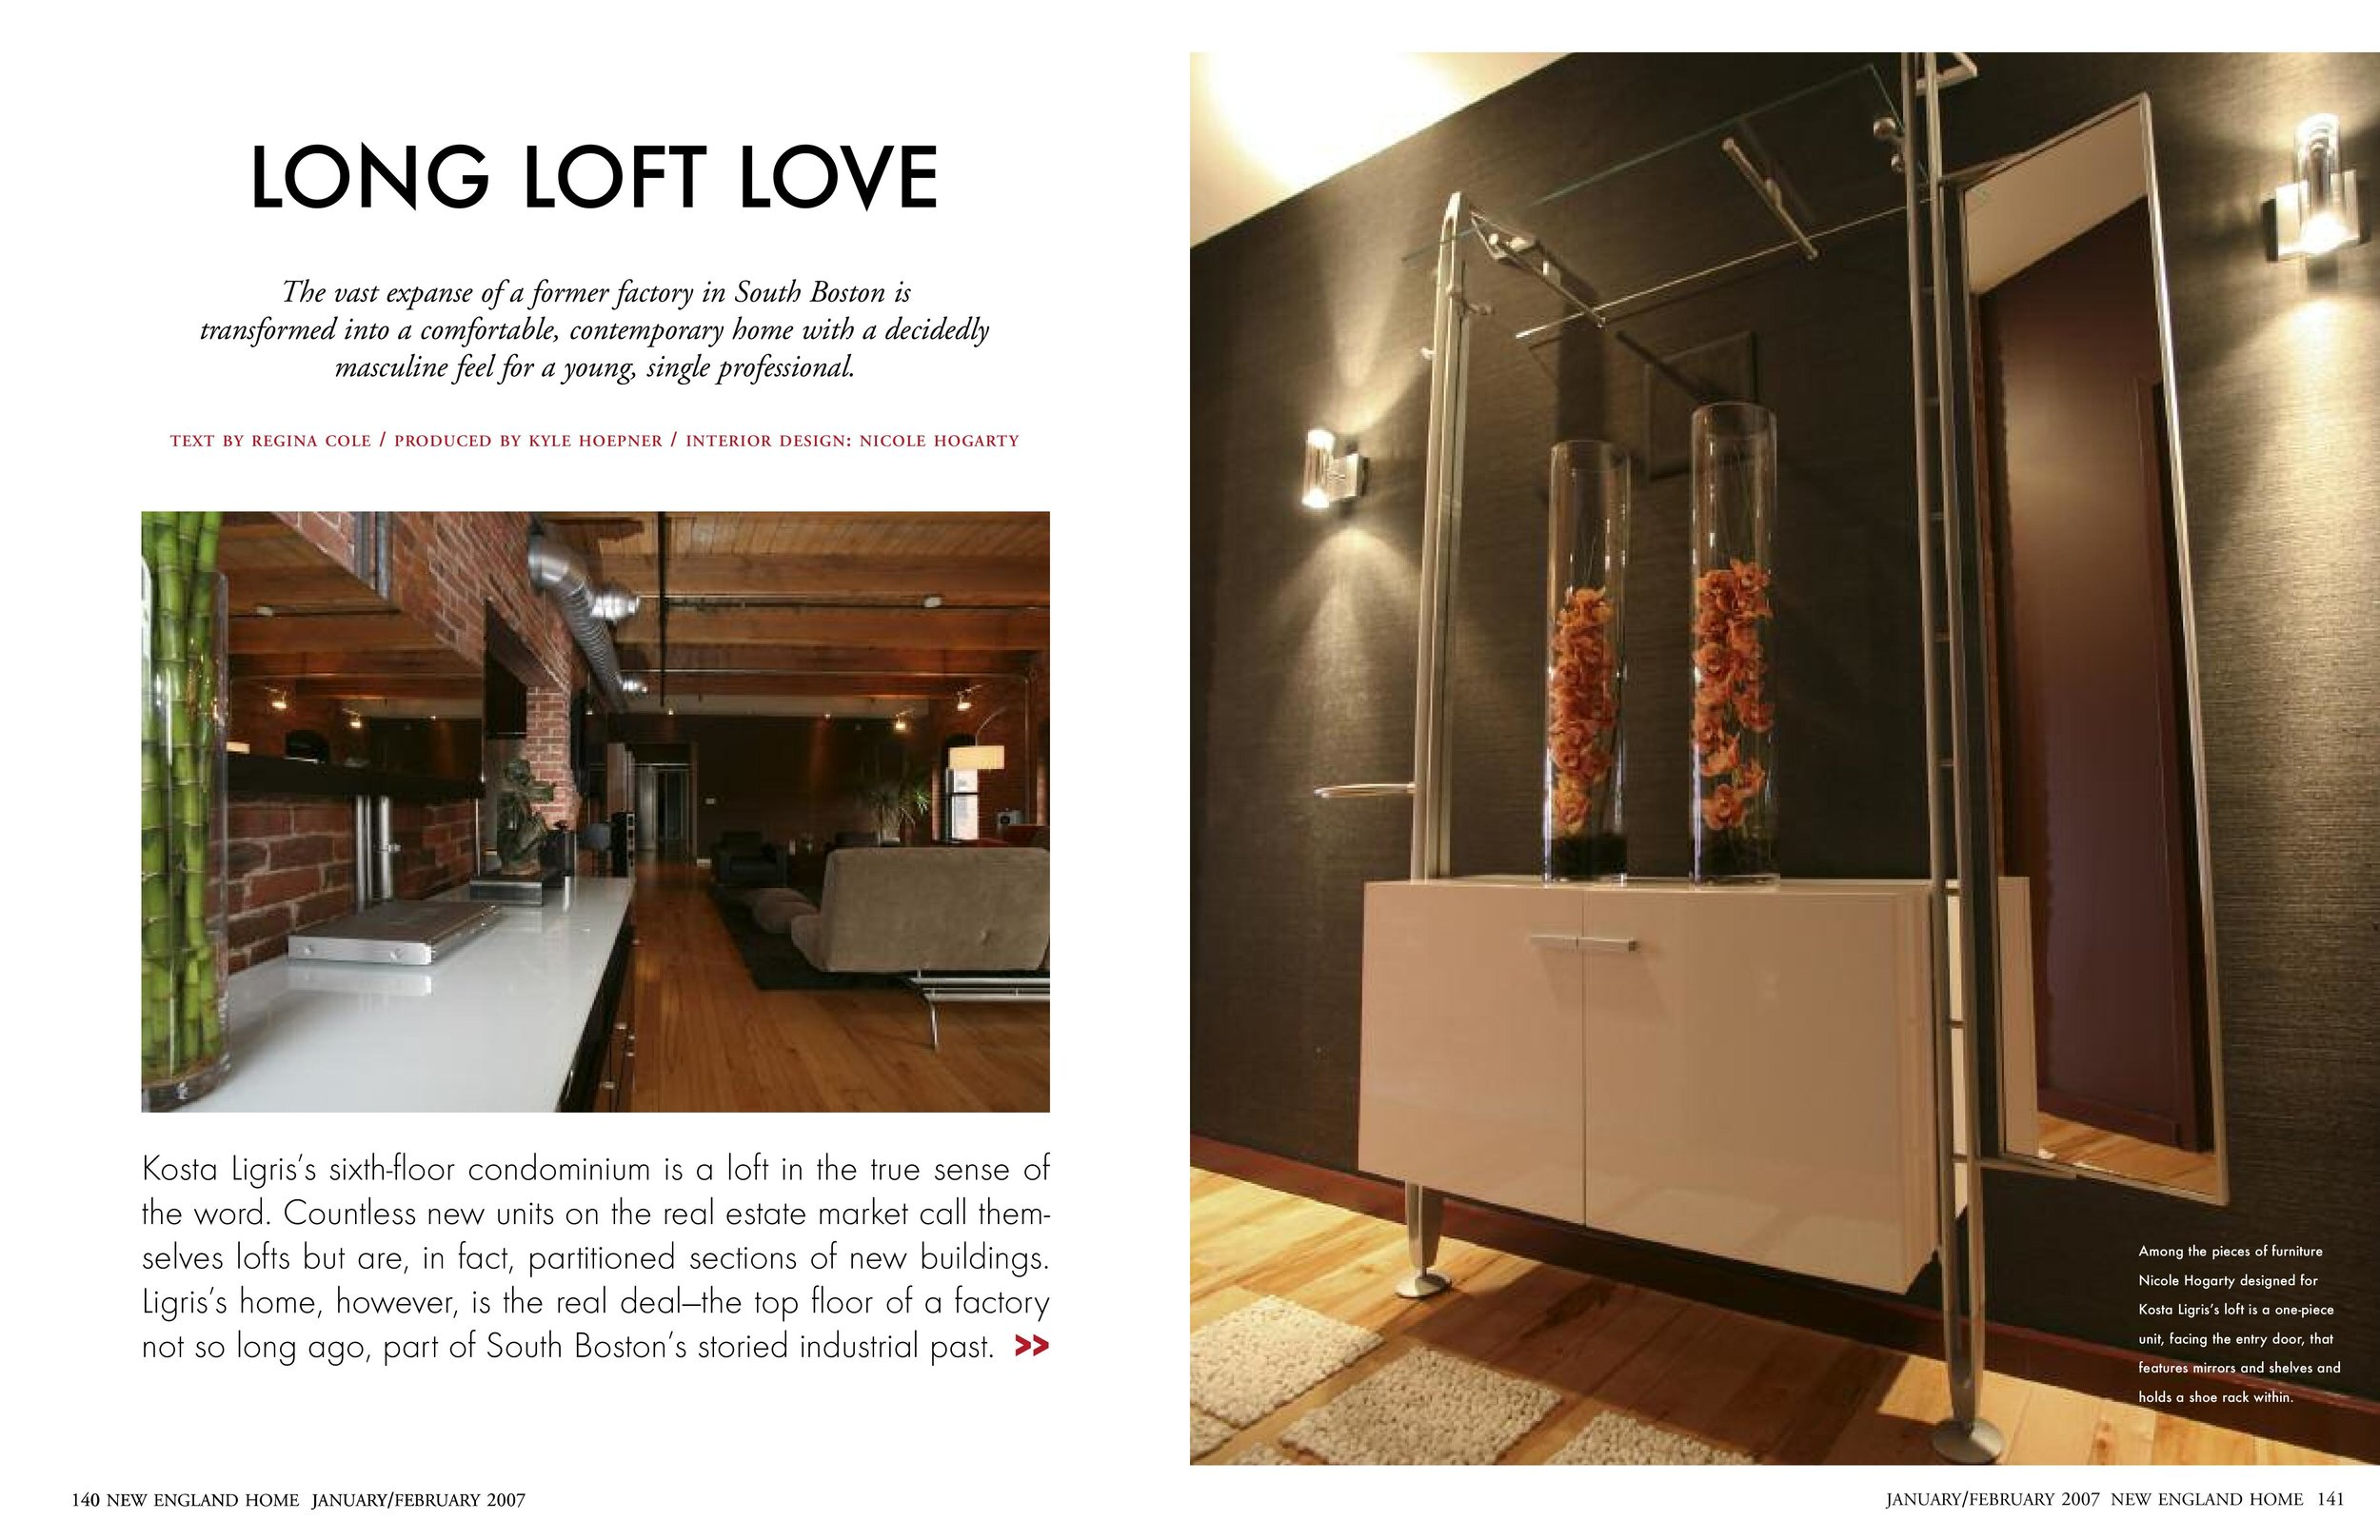 long-loft-love-page-001.jpg